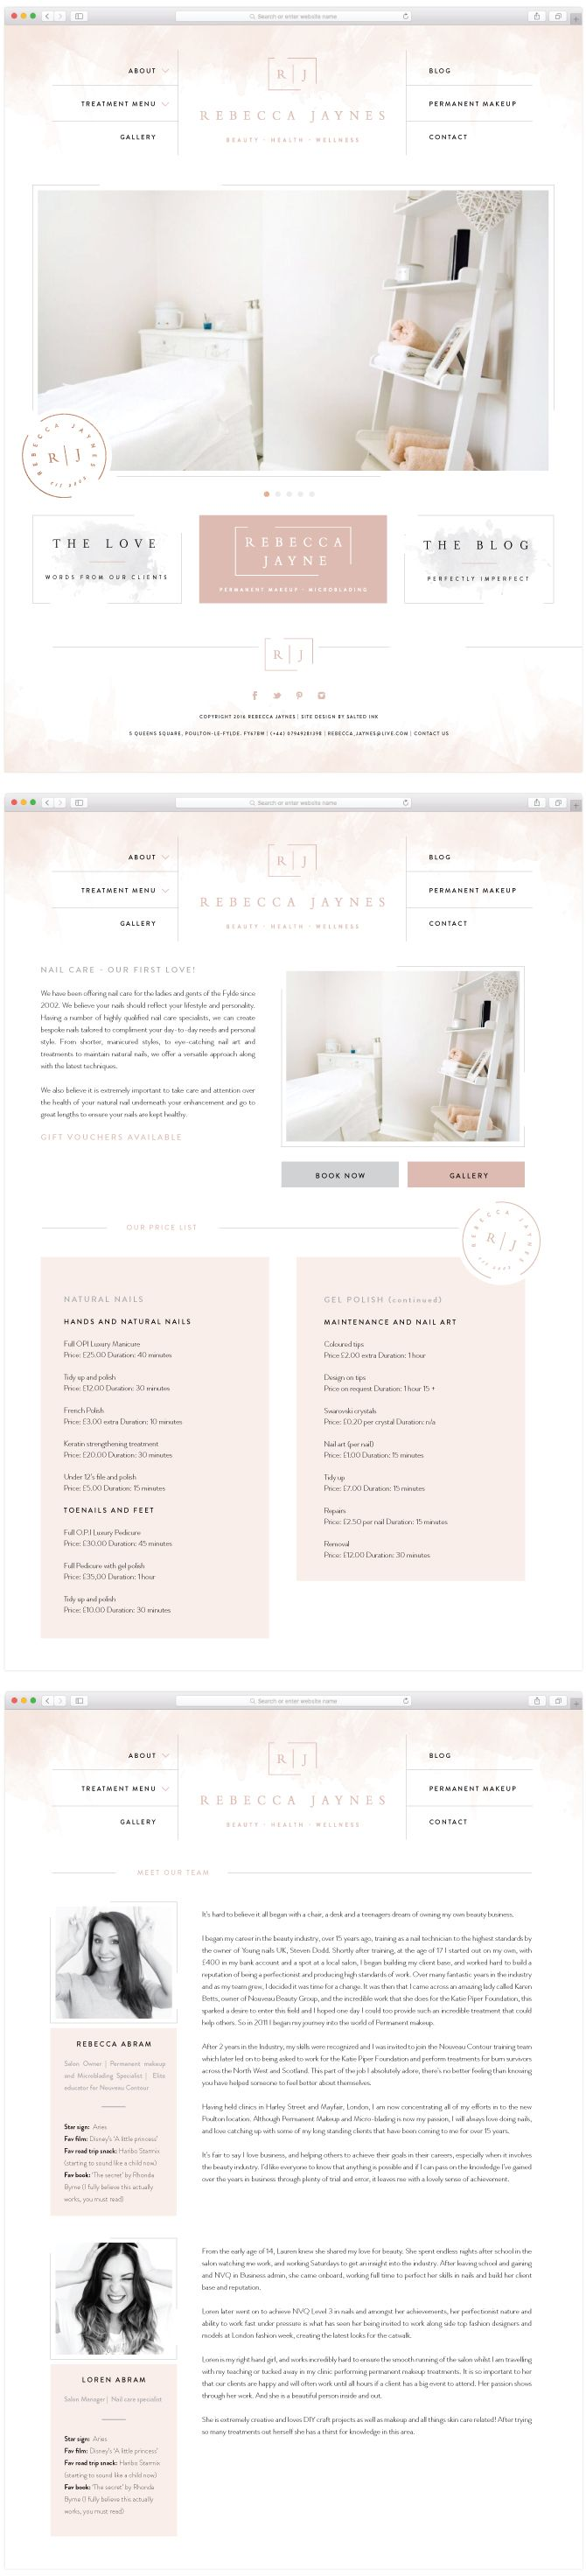 Rebecca Jaynes Beauty Salon Brand Design by Salted Ink   Salon Branding   Brand Design and Website Design   View the full brand transformation at www.saltedink.com  